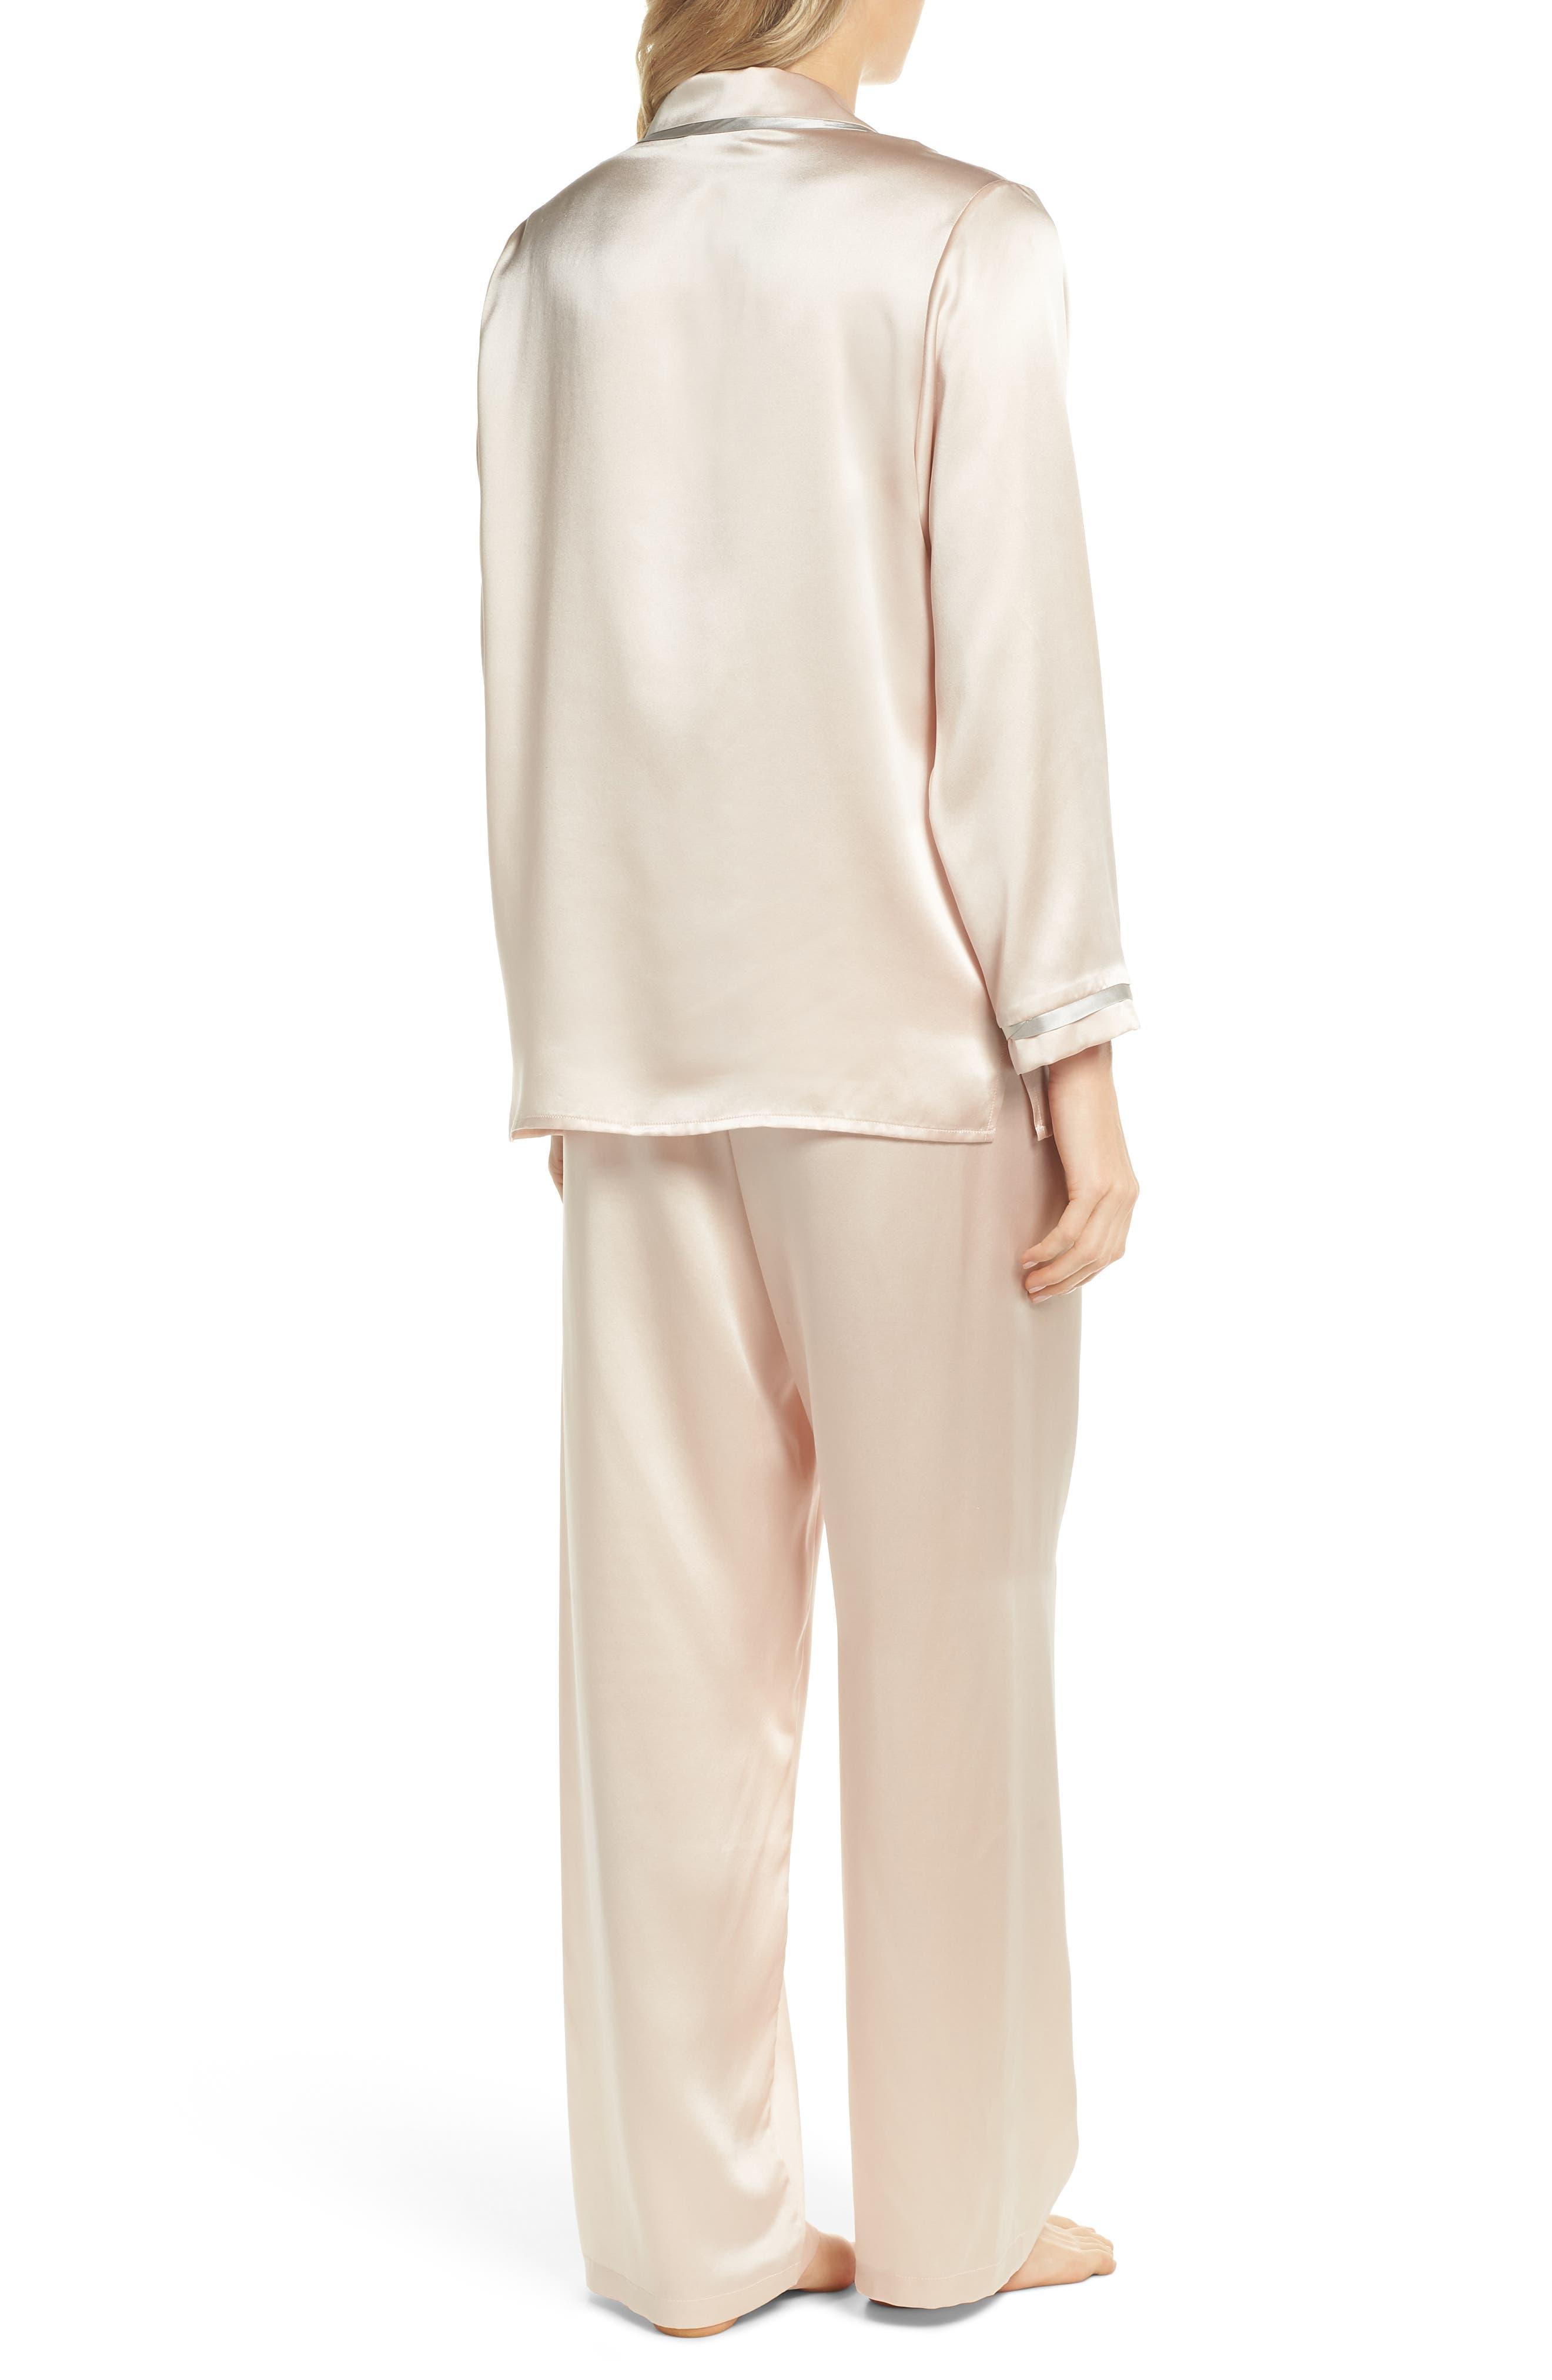 Coco Silk Pajamas,                             Alternate thumbnail 2, color,                             Rose Quartz / Antique Silver